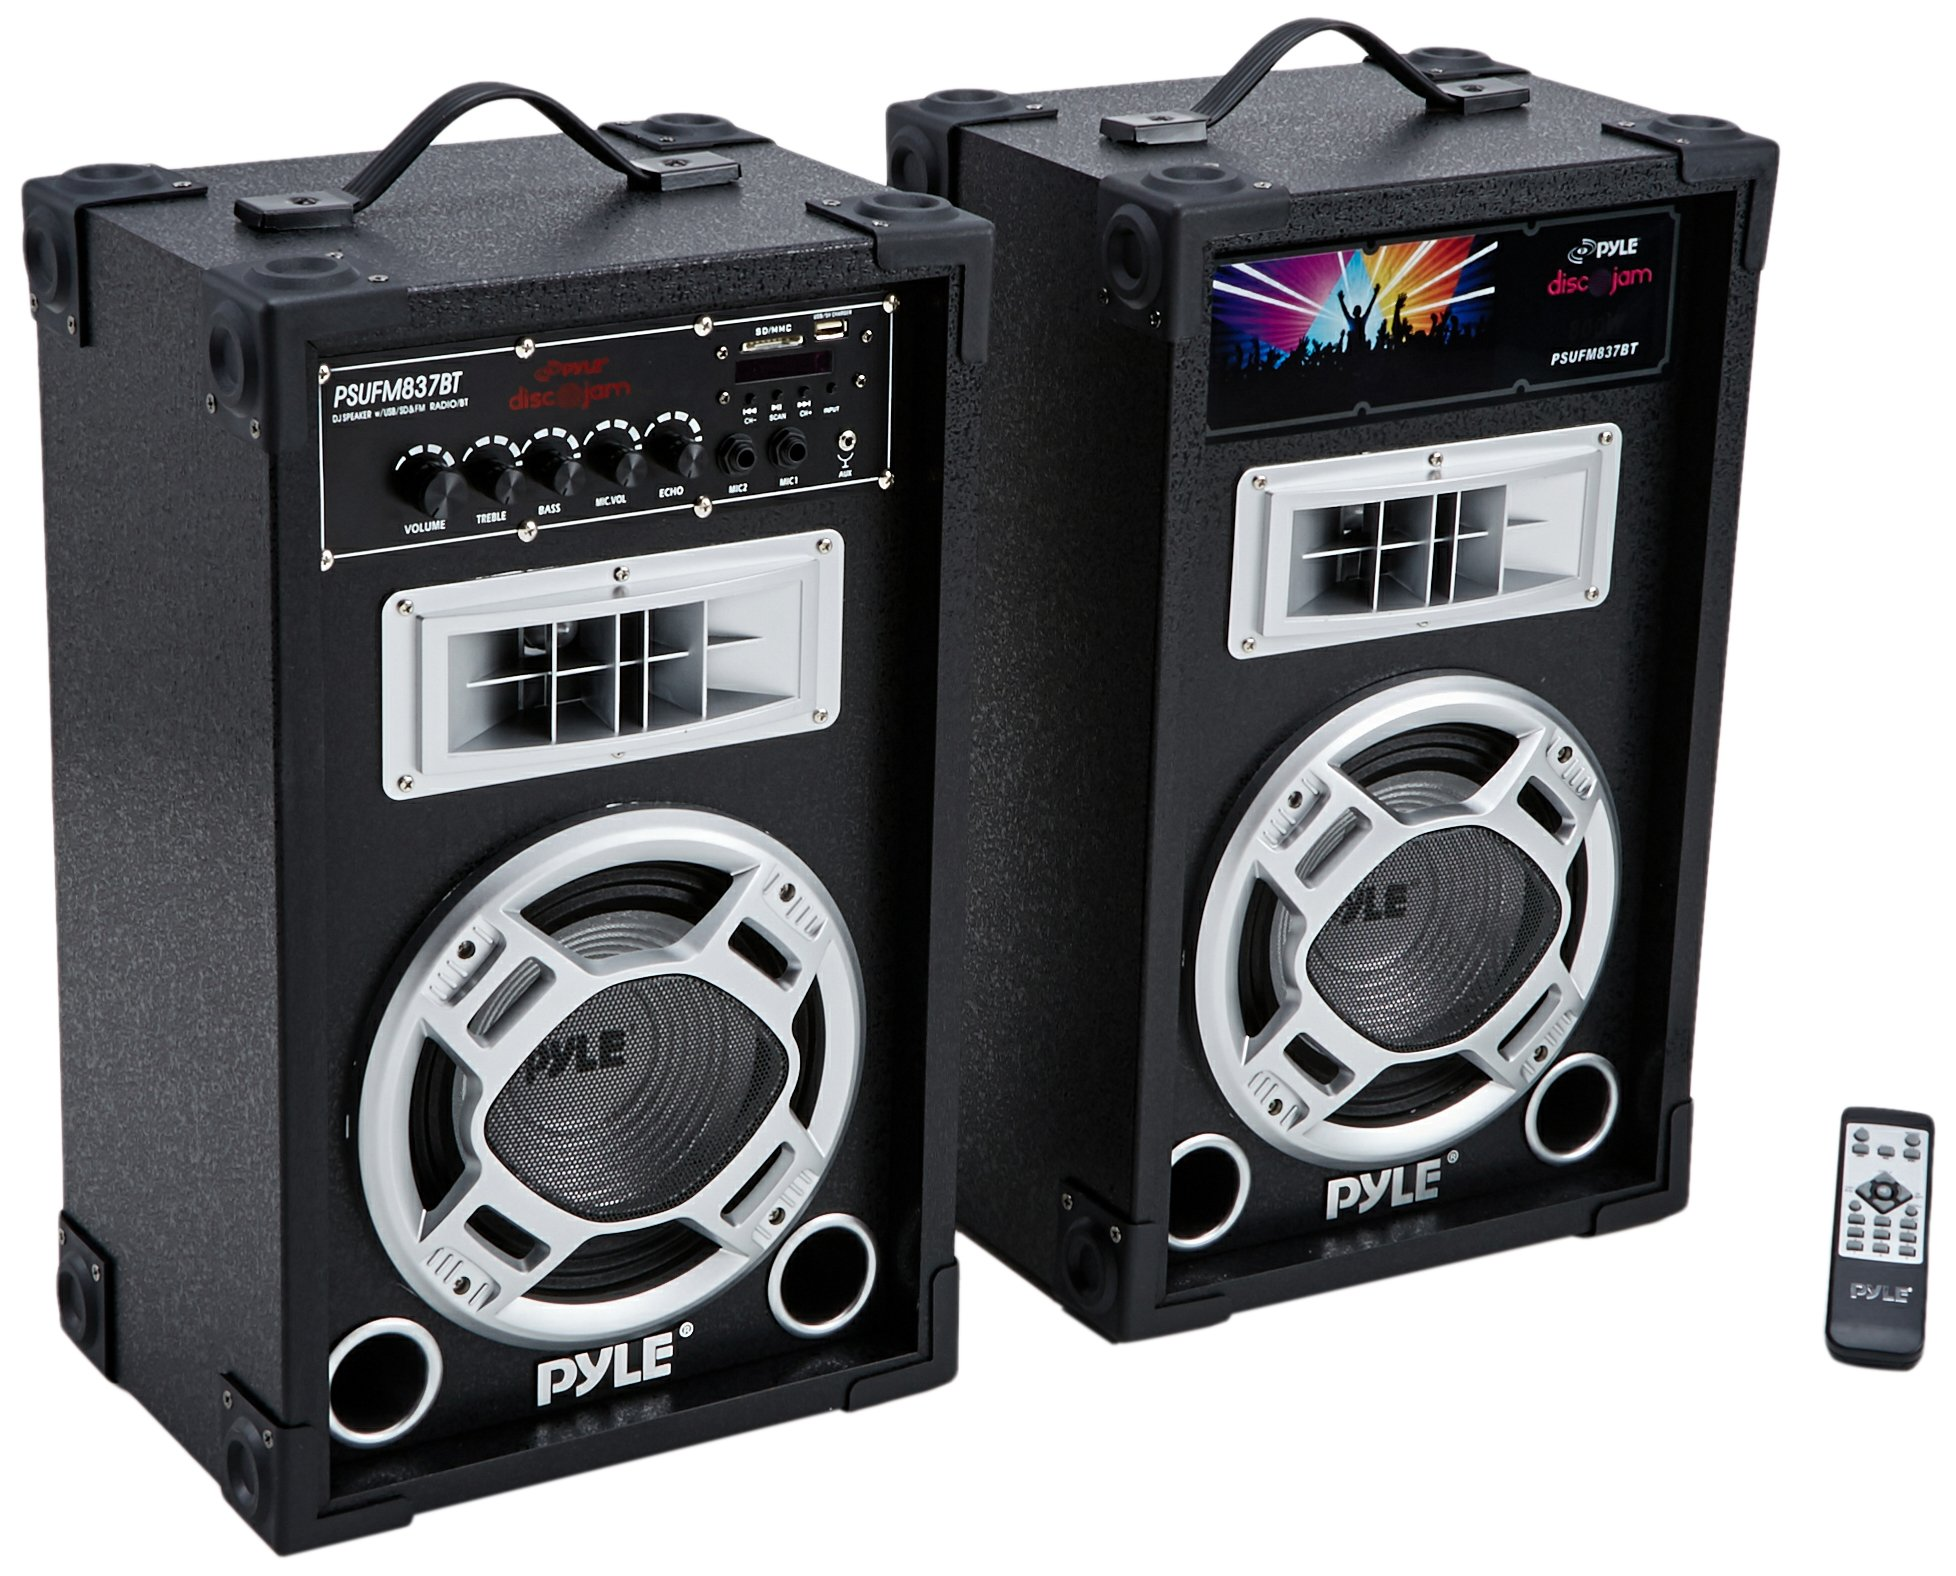 Pyle Dual 800 Watt Powered PA Bluetooth Speaker System Disco Jam Two-Way DJ Speakers | karaoke machine  | USB/SD Card Readers, FM Radio, 3.5 mm AUX Input (Active & Passive Speakers)(PSUFM837BT)